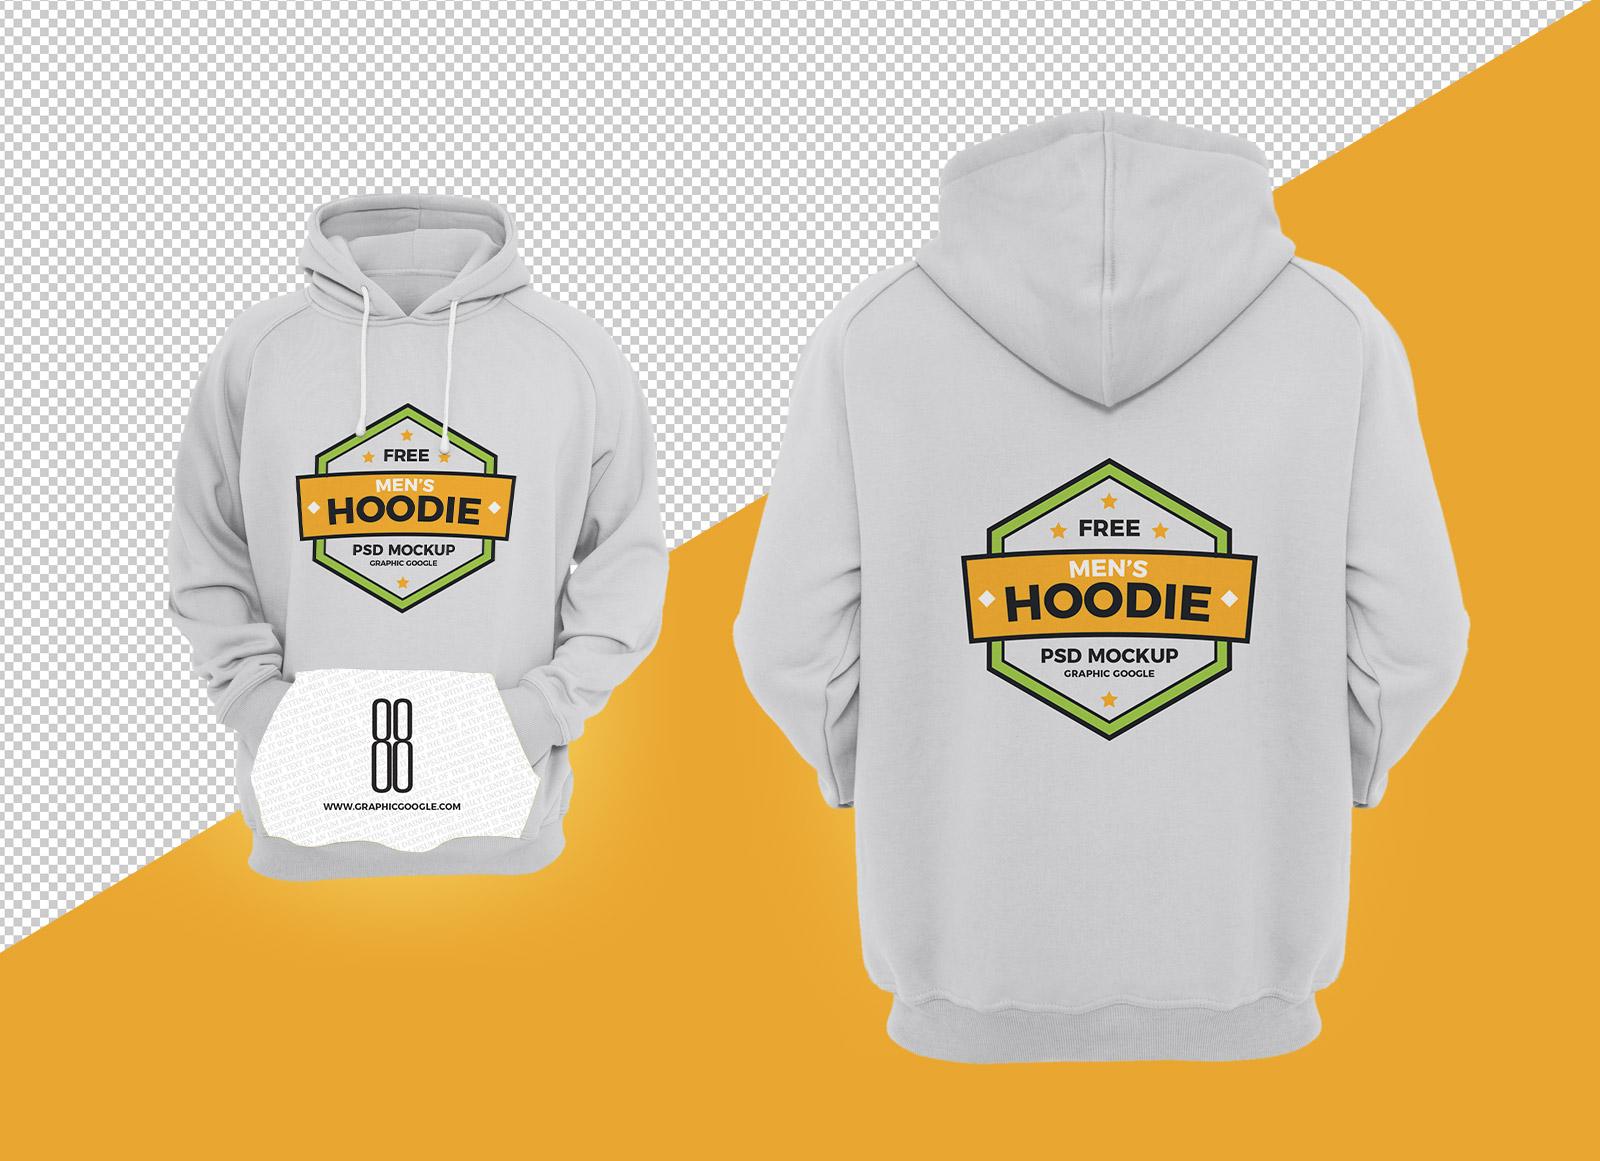 Free men39s hoodie t shirt mockup psd file good mockups for Free tshirt mockup psd